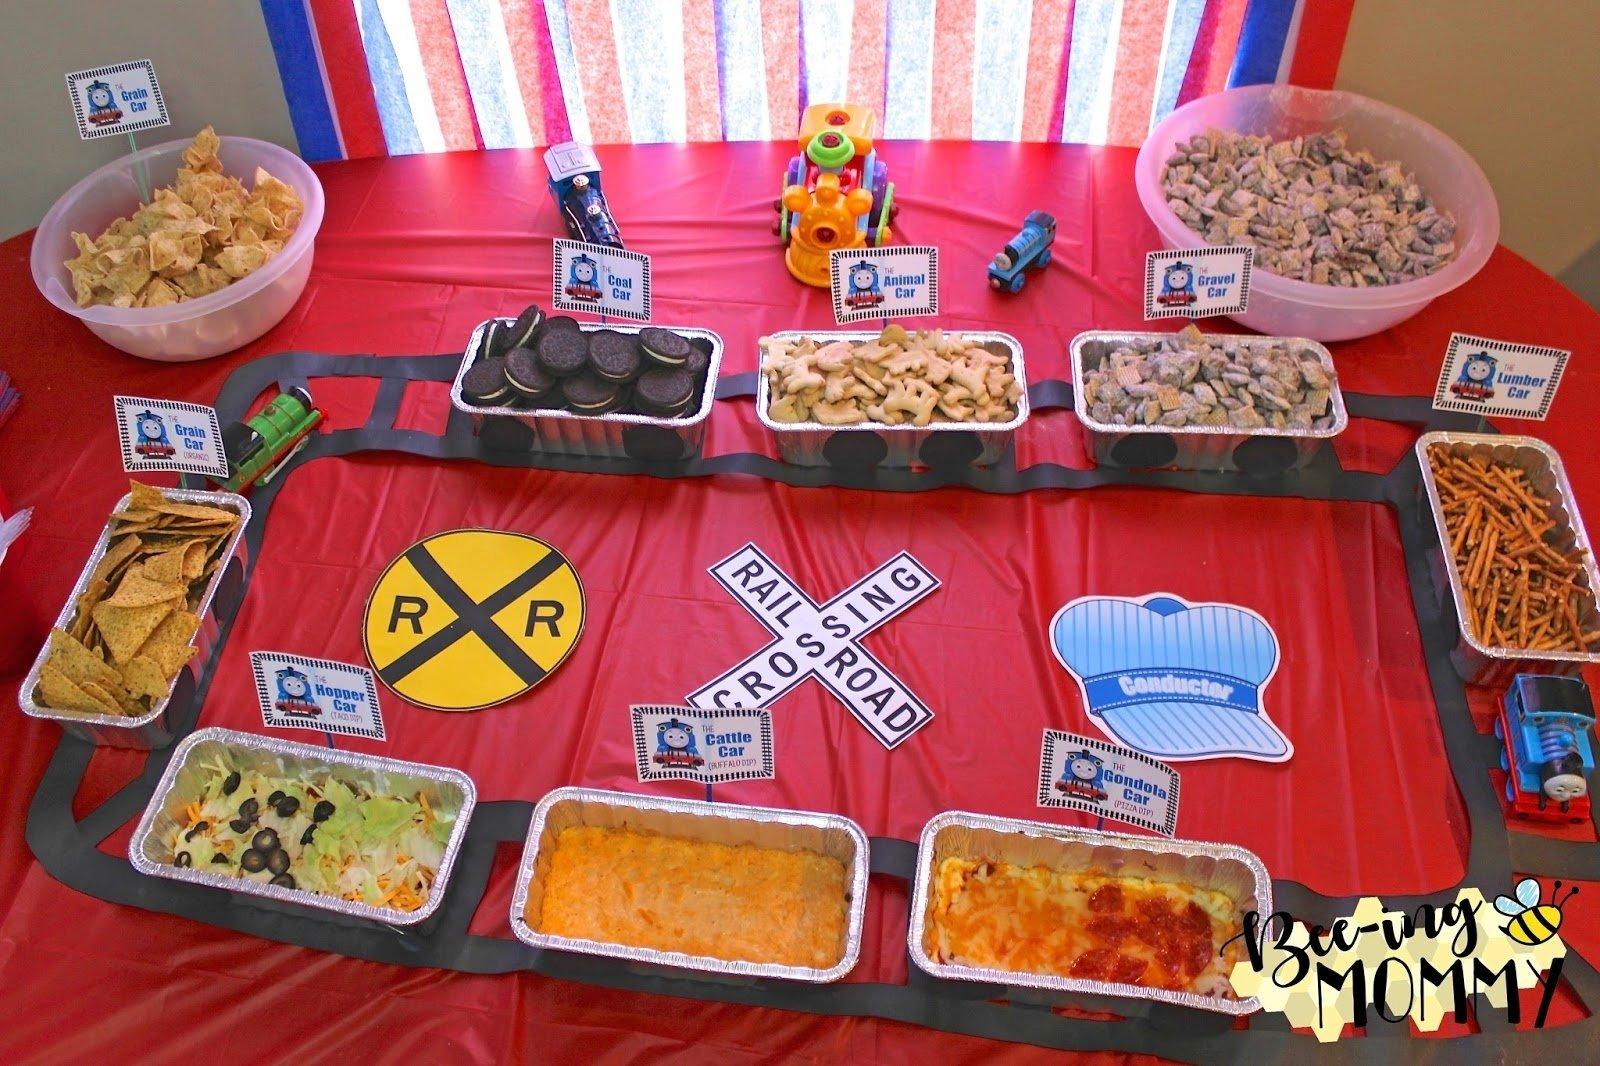 10 Fabulous Thomas The Train Party Food Ideas bee ing mommy blog thomas the train birthday party chugga chugga 1 2021